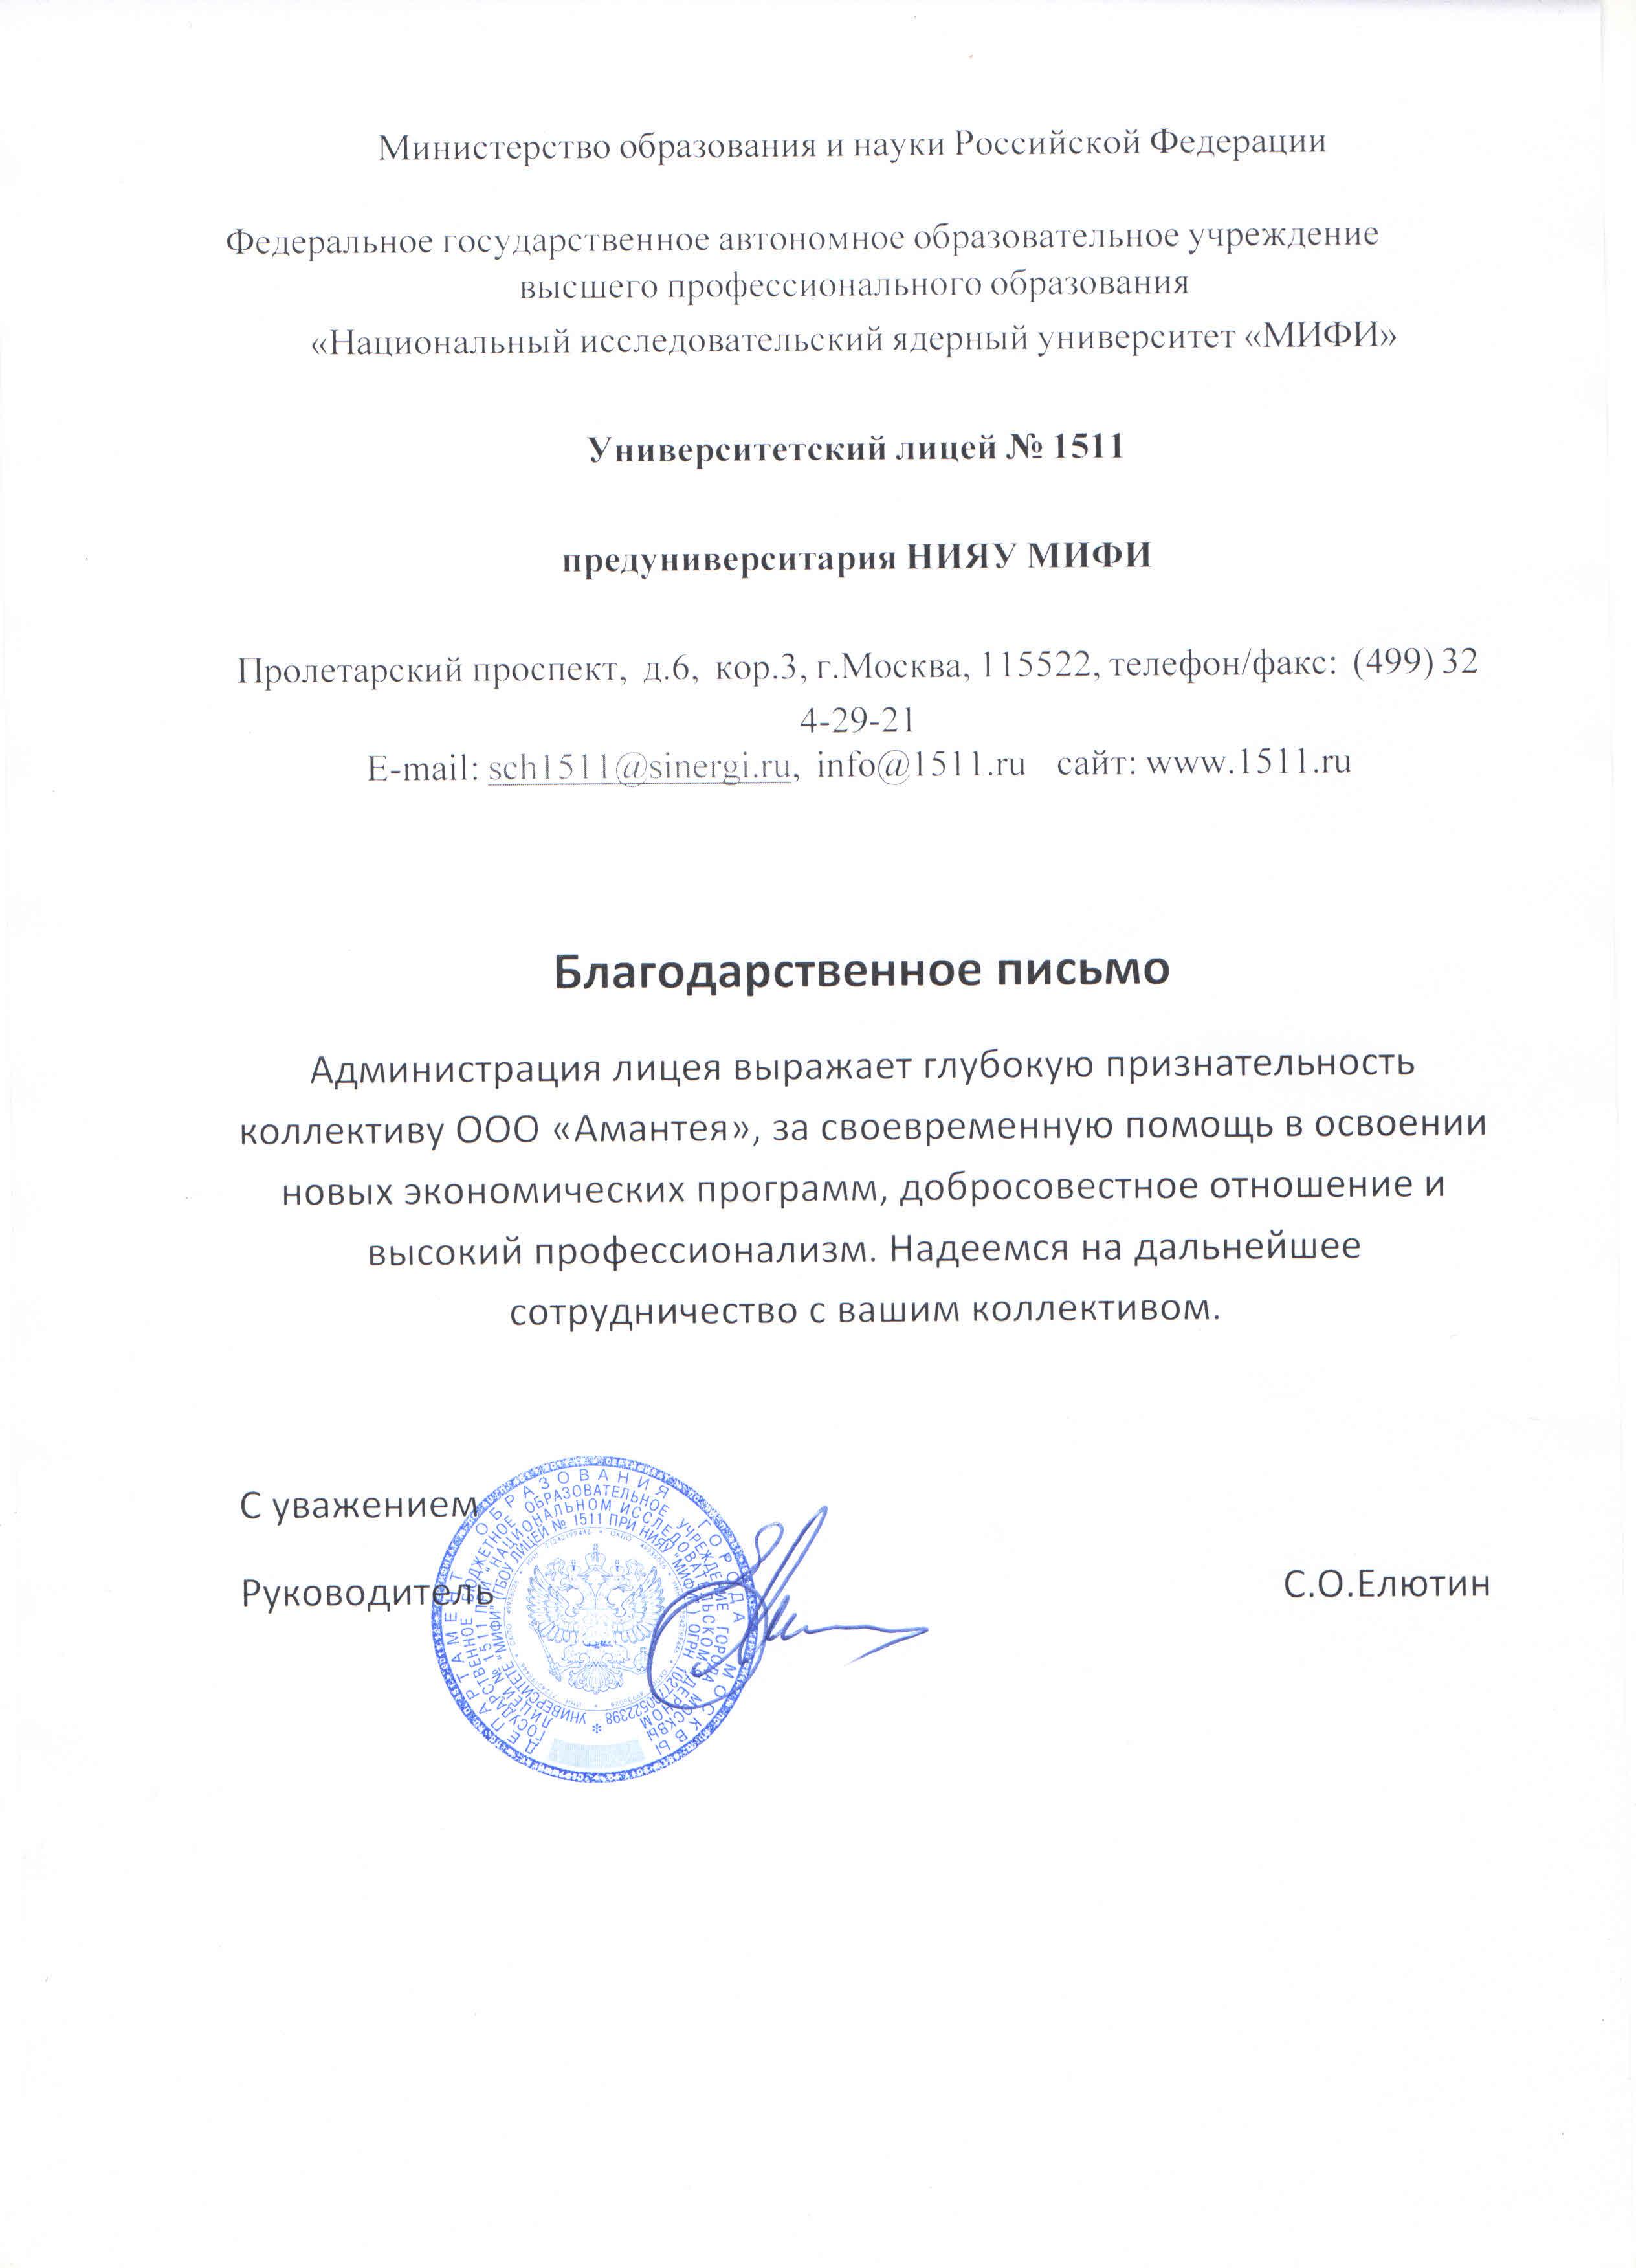 ГБОУ СОШ №1511